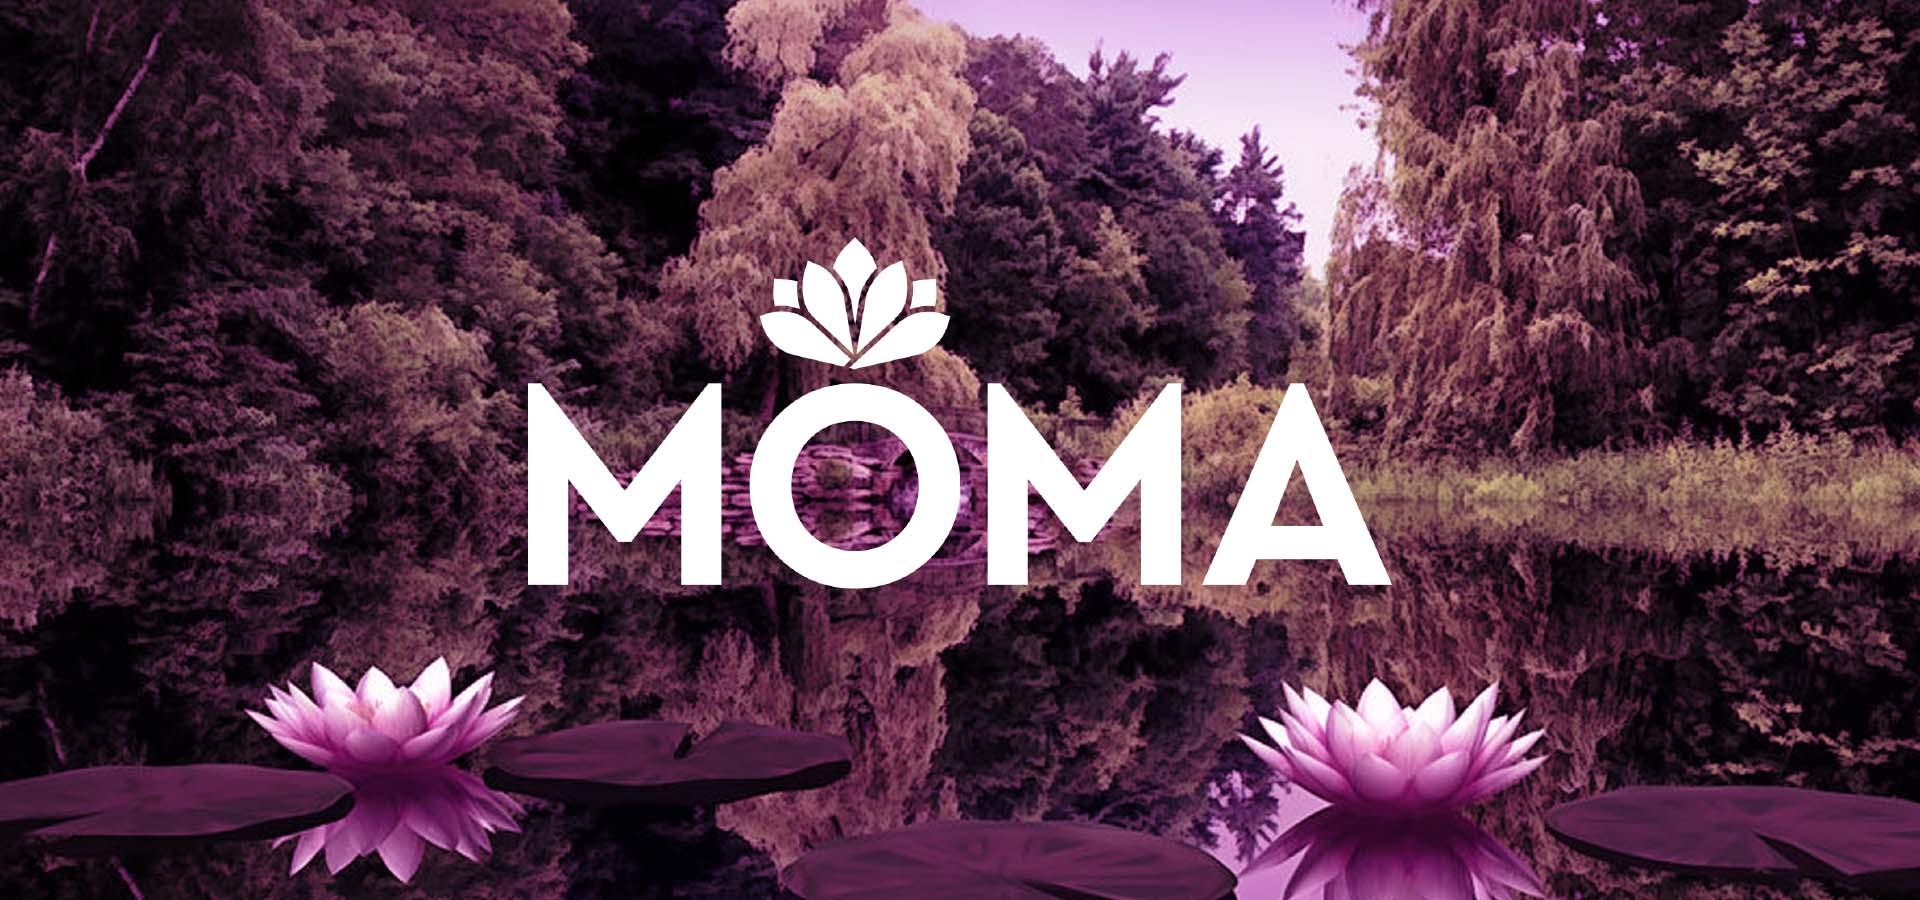 Moma-Design-1516